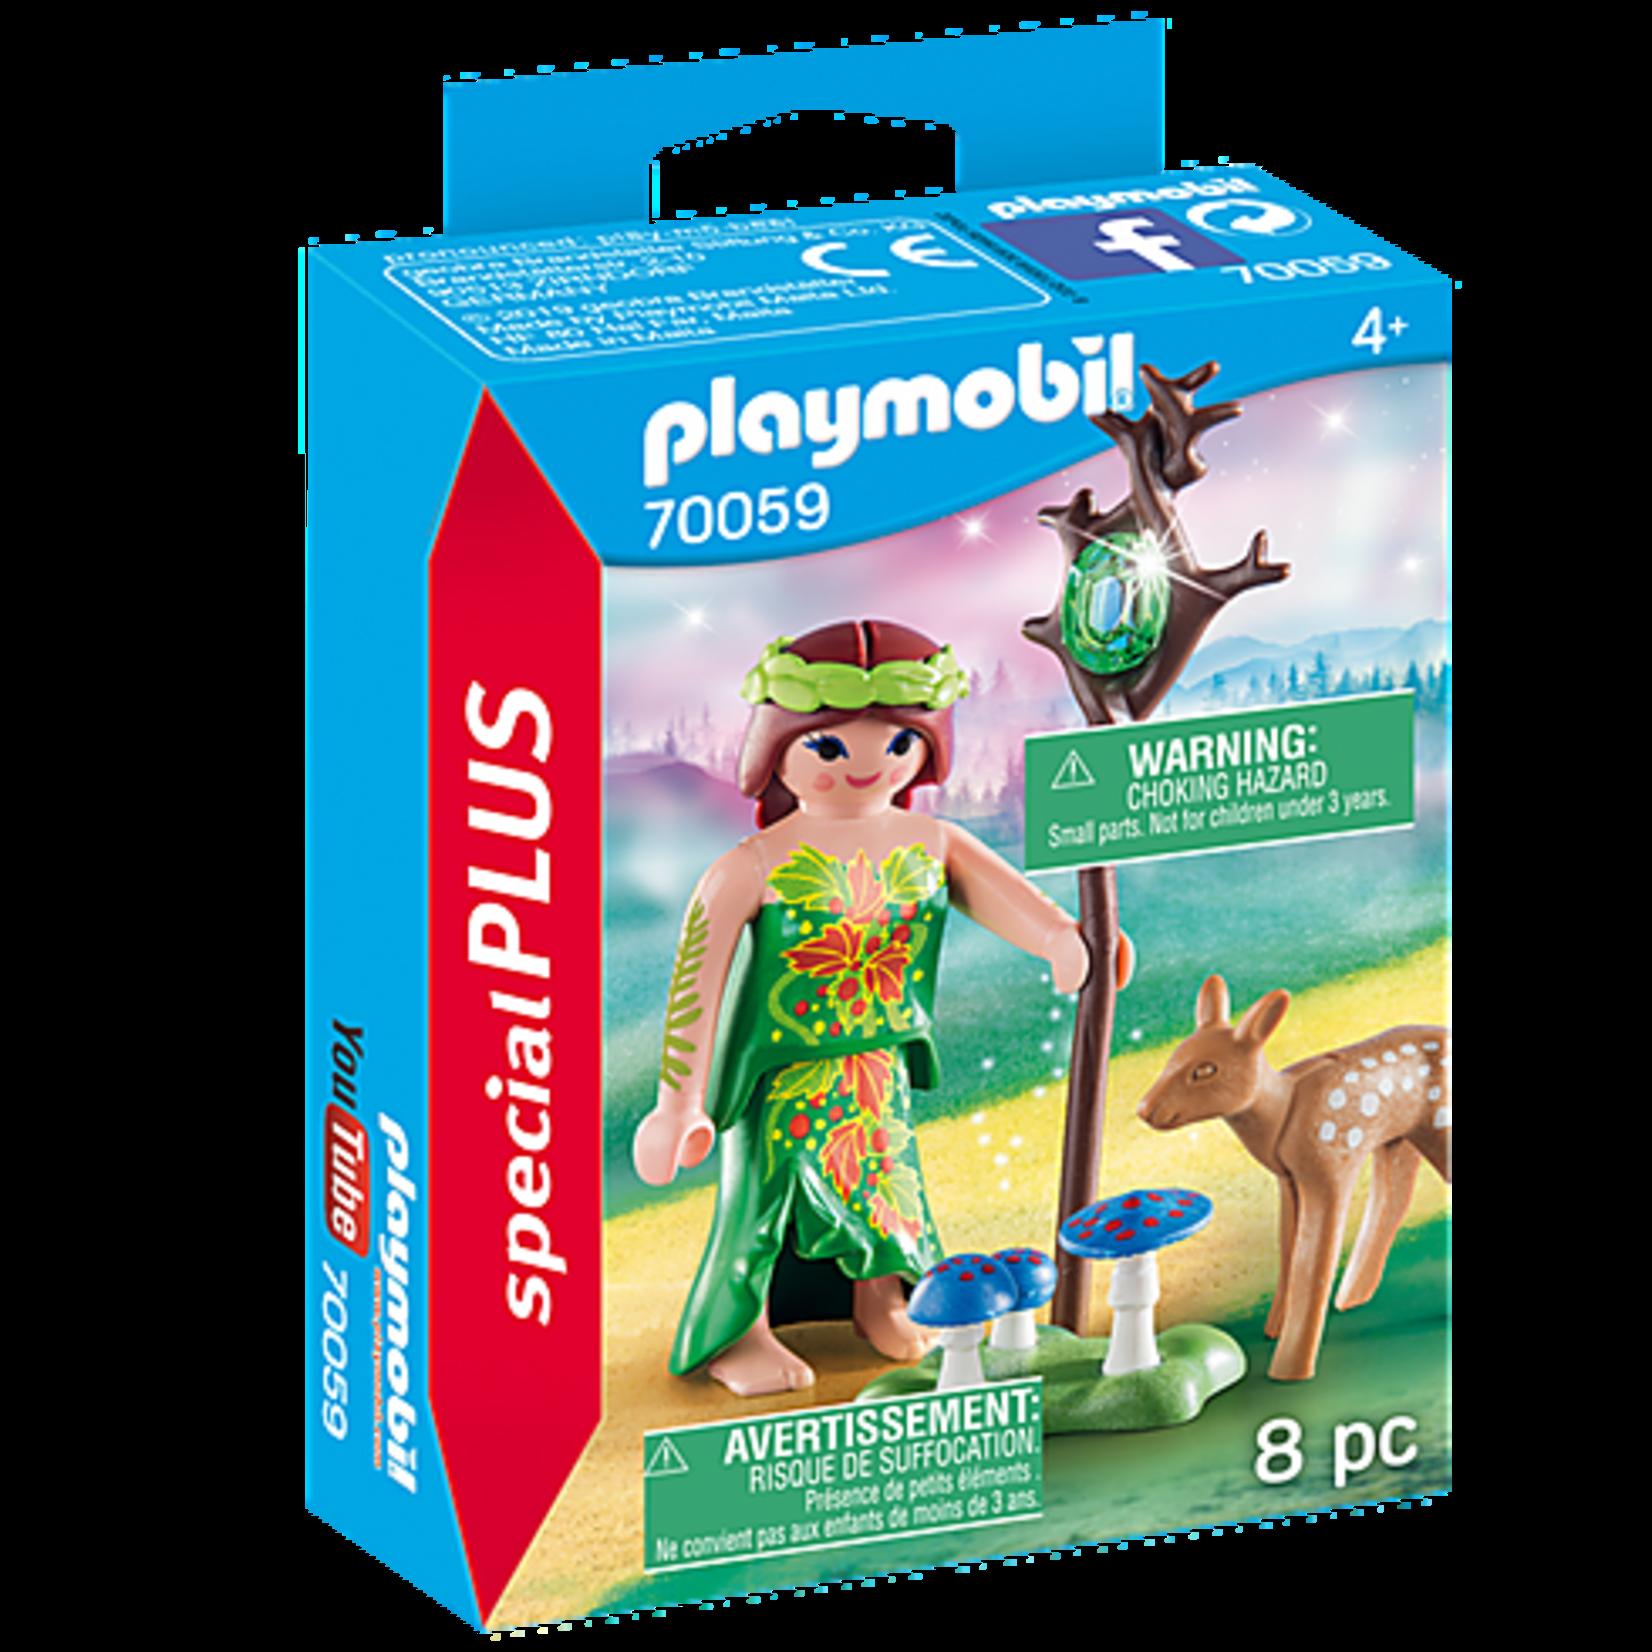 Playmobil Fairy with Deer - Playmobil 70059